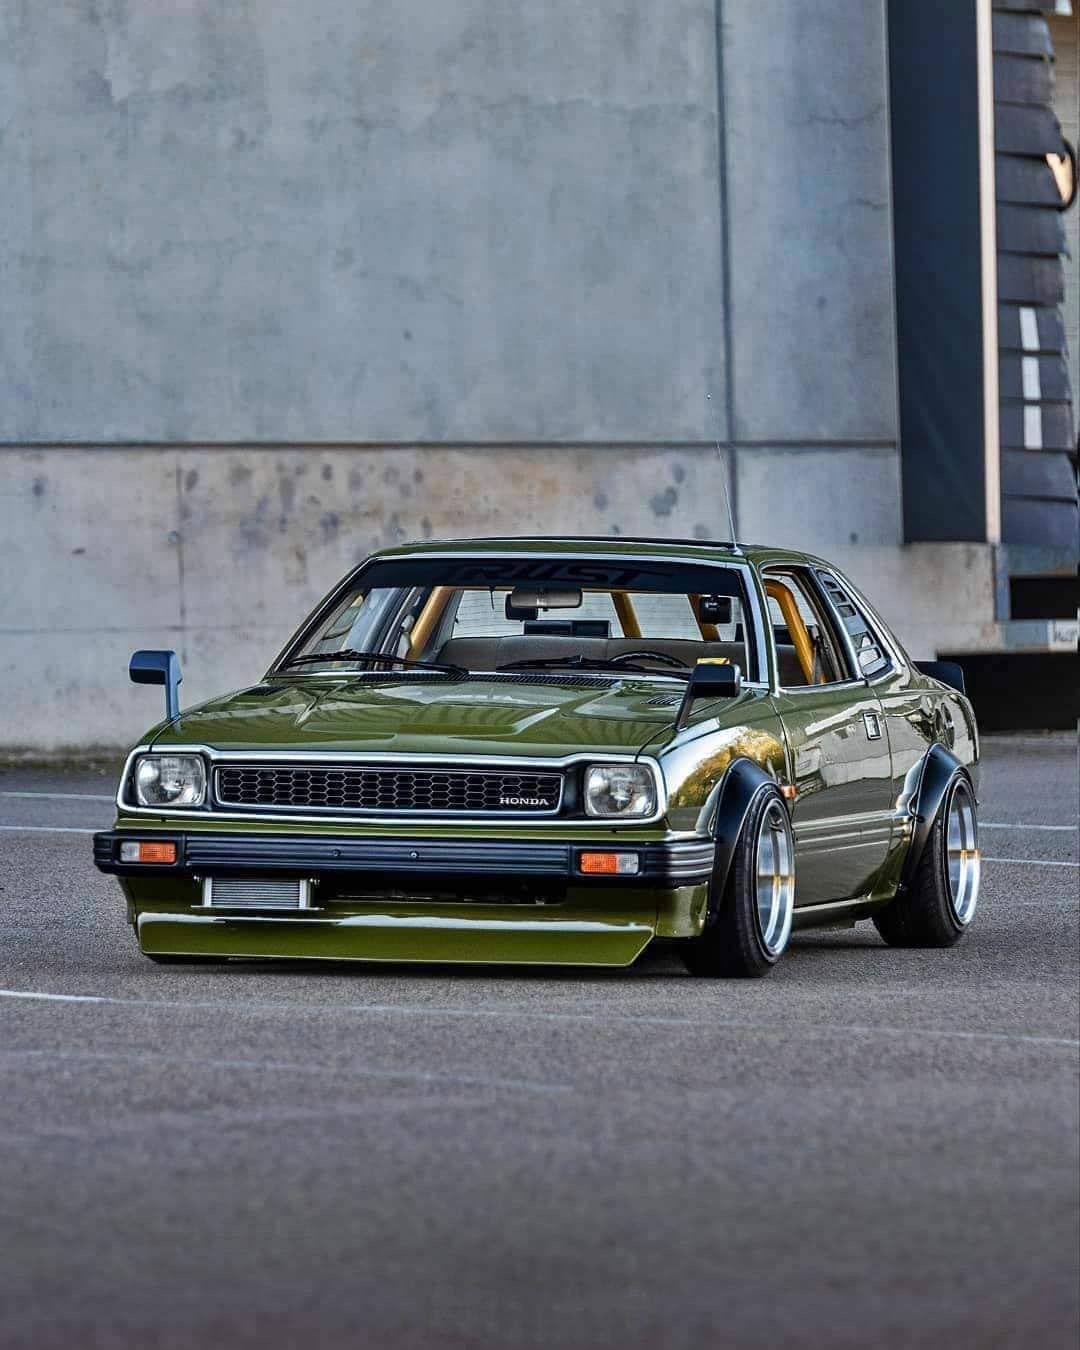 AWESOME HONDA Honda prelude, Classic japanese cars